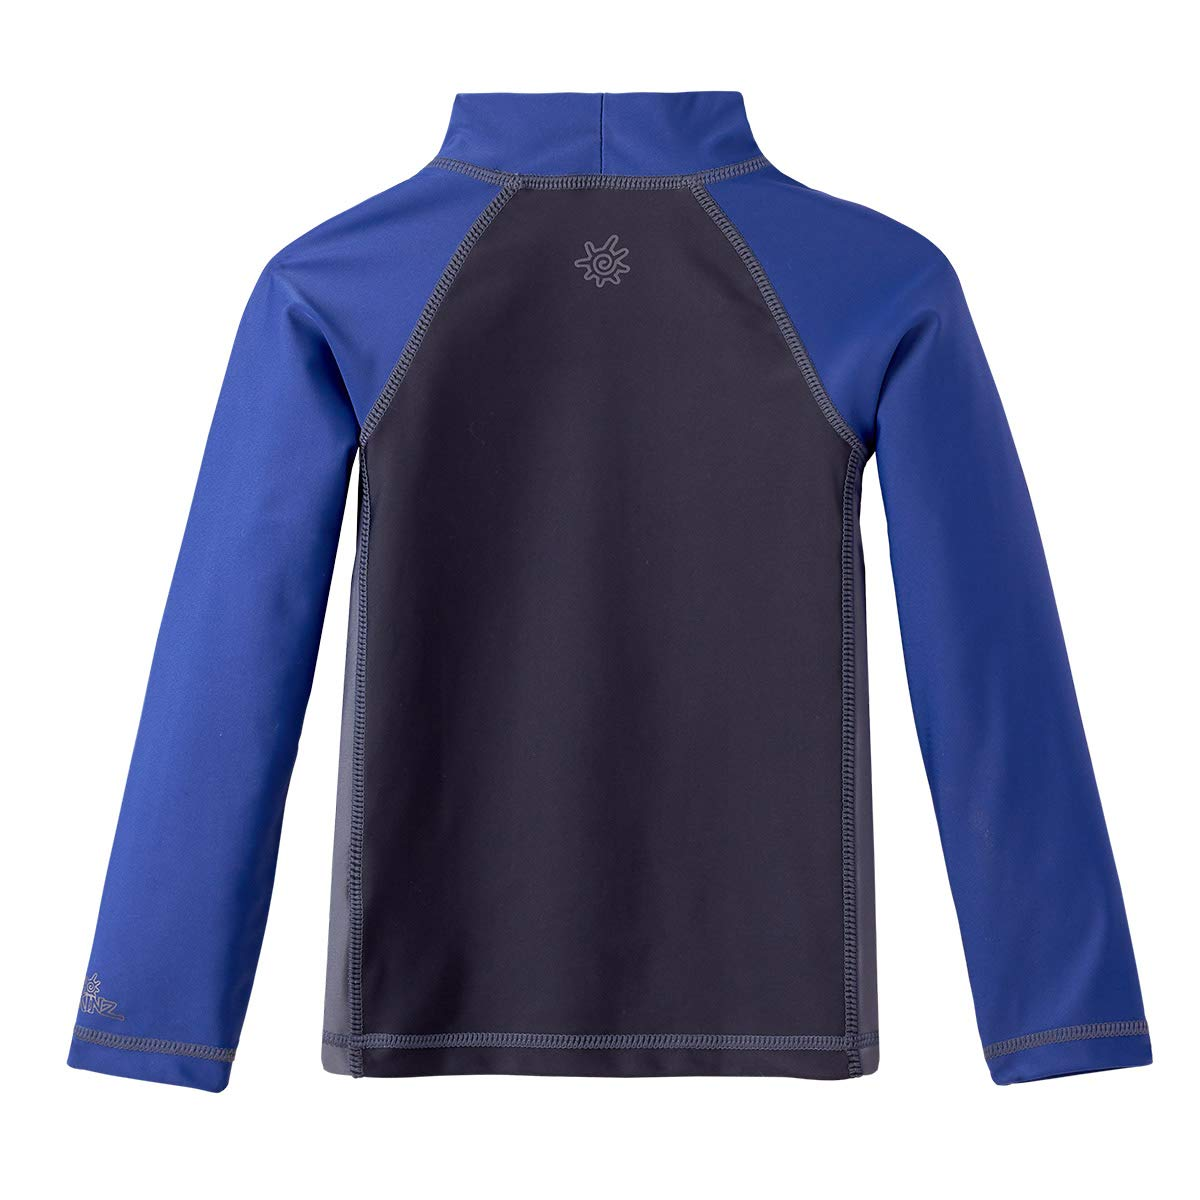 2T Boys Long Sleeve Active Sun /& Swim Shirt UV SKINZ UPF 50 Charcoal//Washed Navy